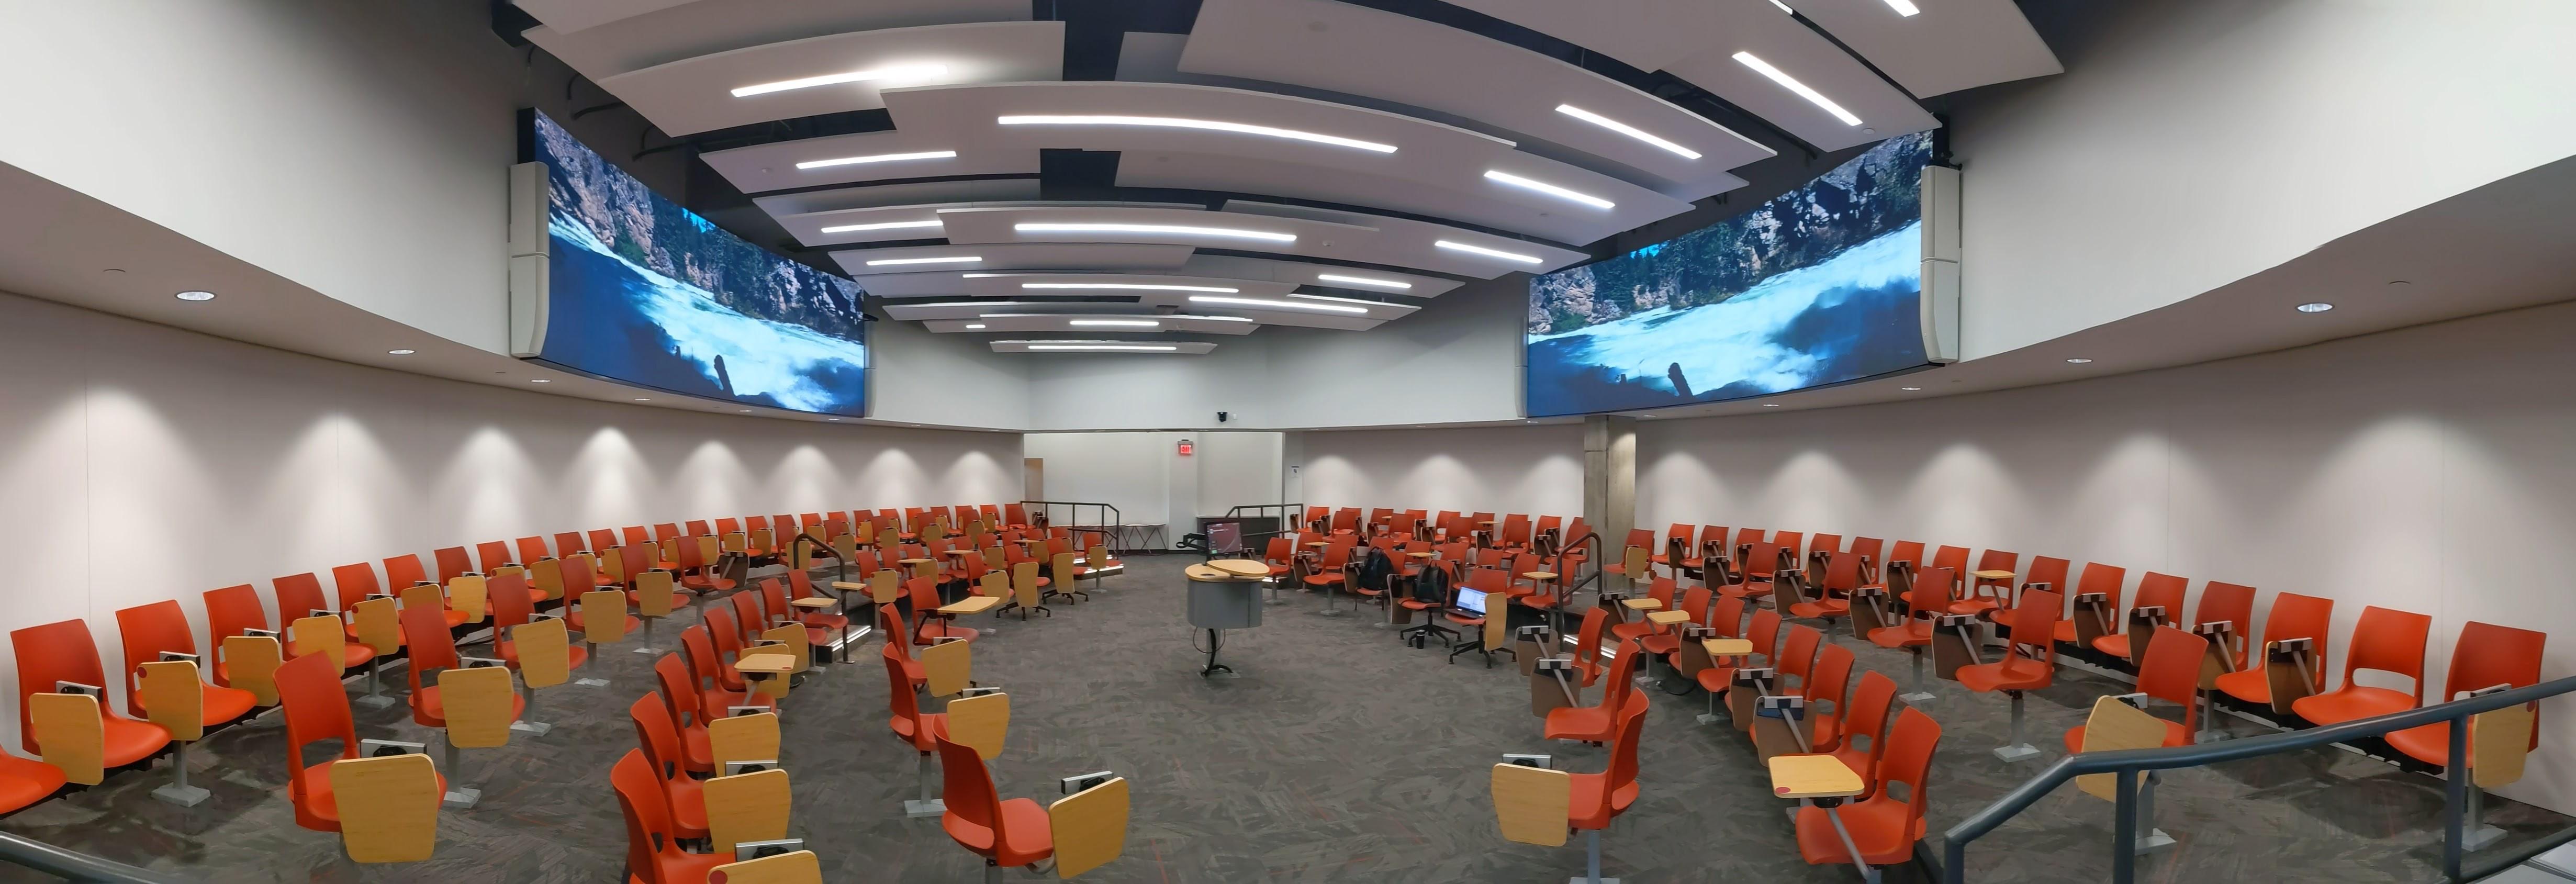 Classroom with displays 2 | AVIXA